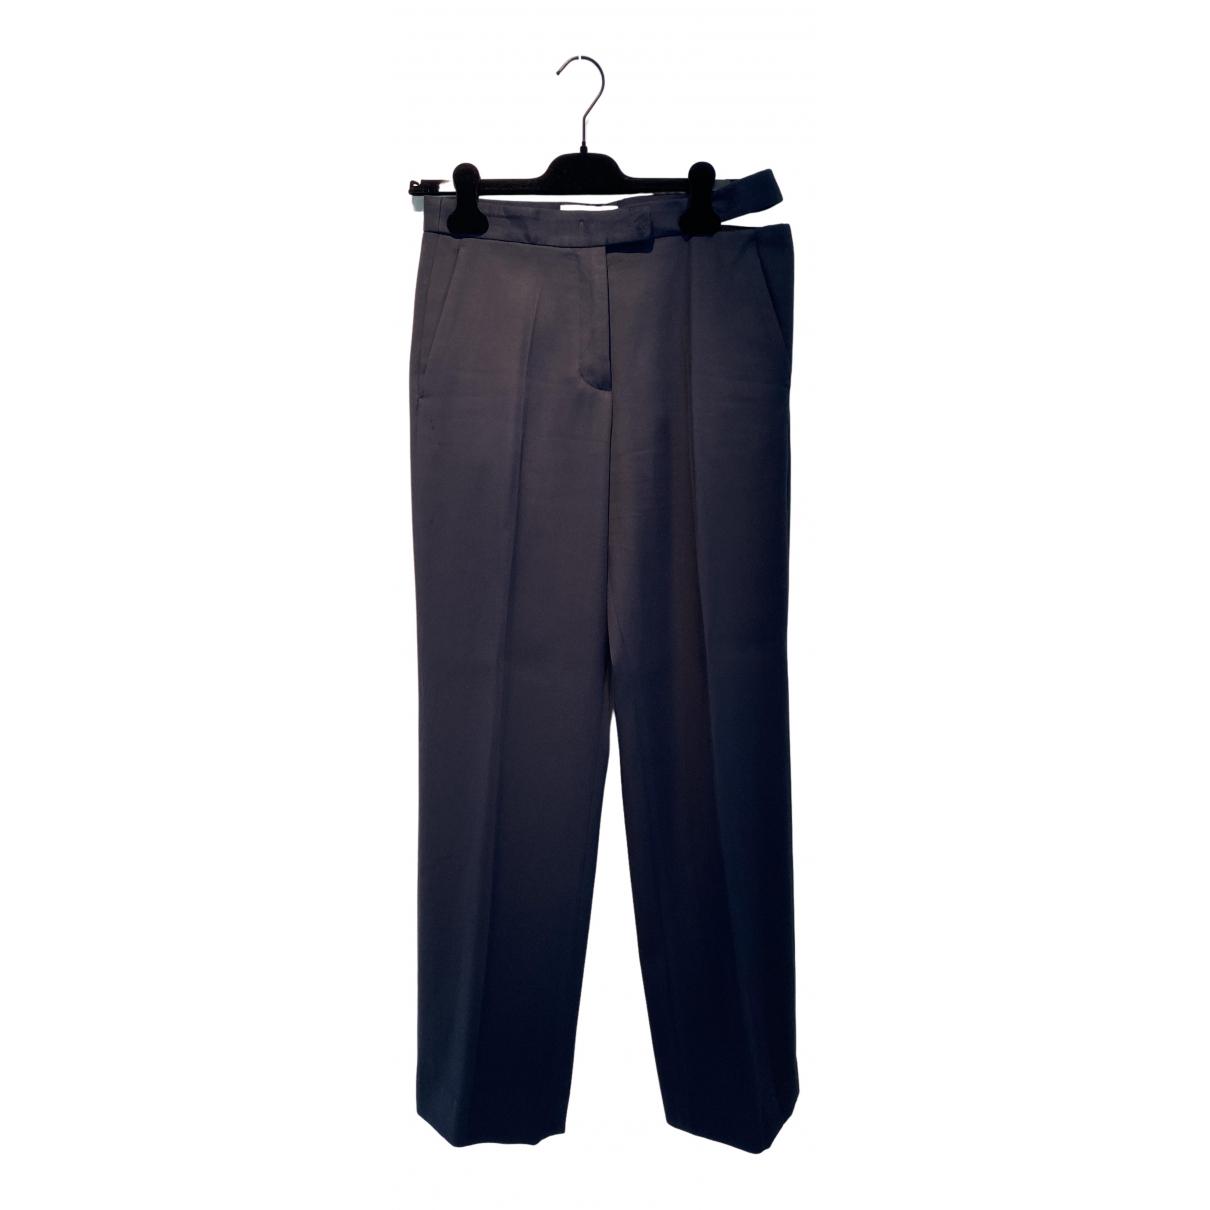 Maison Martin Margiela \N Navy Cotton Trousers for Women 40 IT